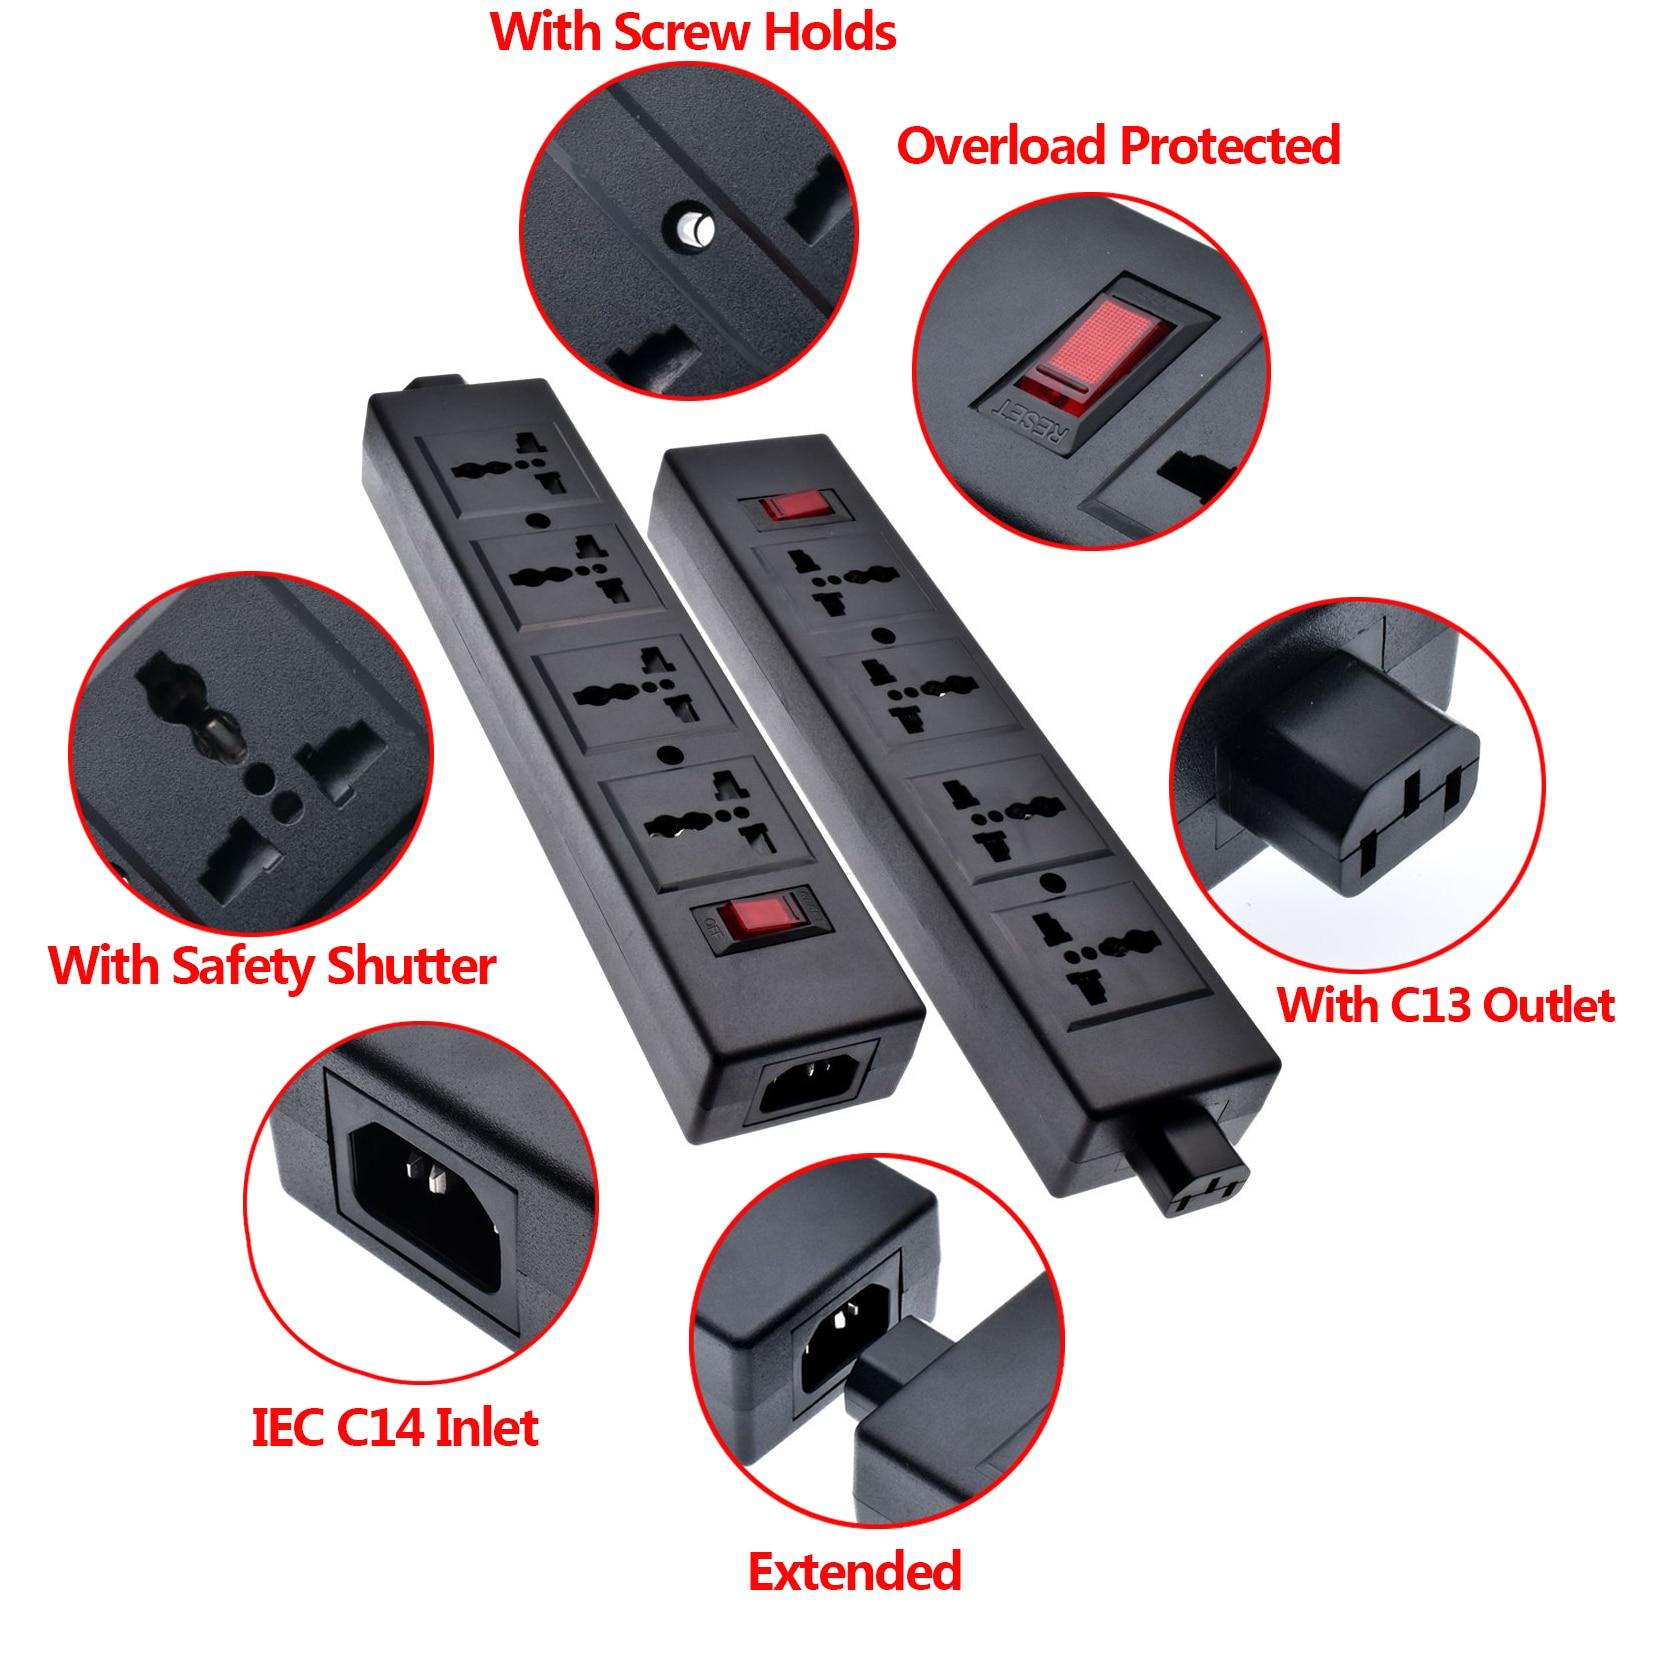 Tira de alimentación PDU extendida para Protector de sobrecarga de laboratorio, con obturador de seguridad salida Universal extendida con salida IEC320 C13